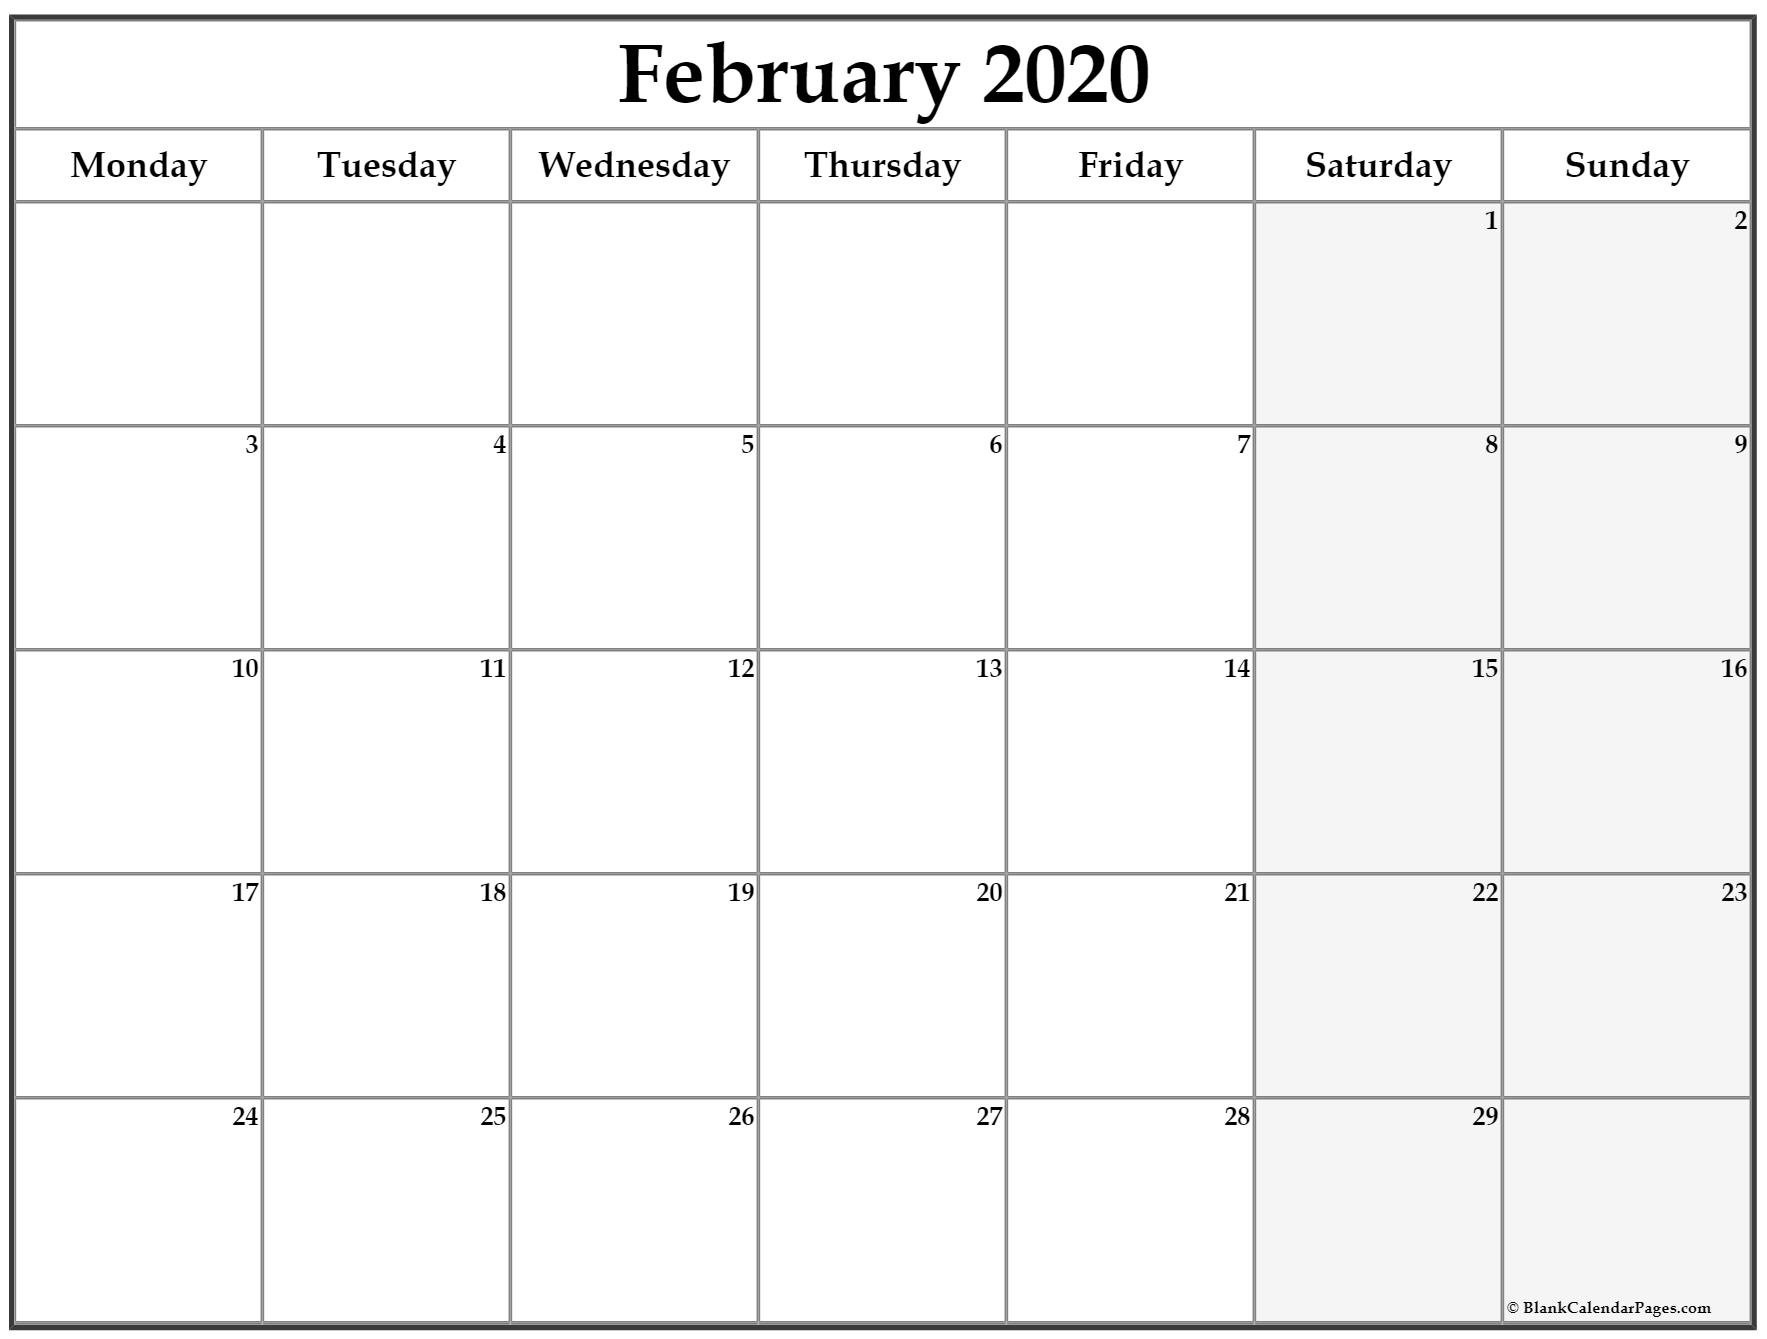 February 2020 Monday Calendar | Monday To Sunday for Monday To Sunday 2020 Calendar